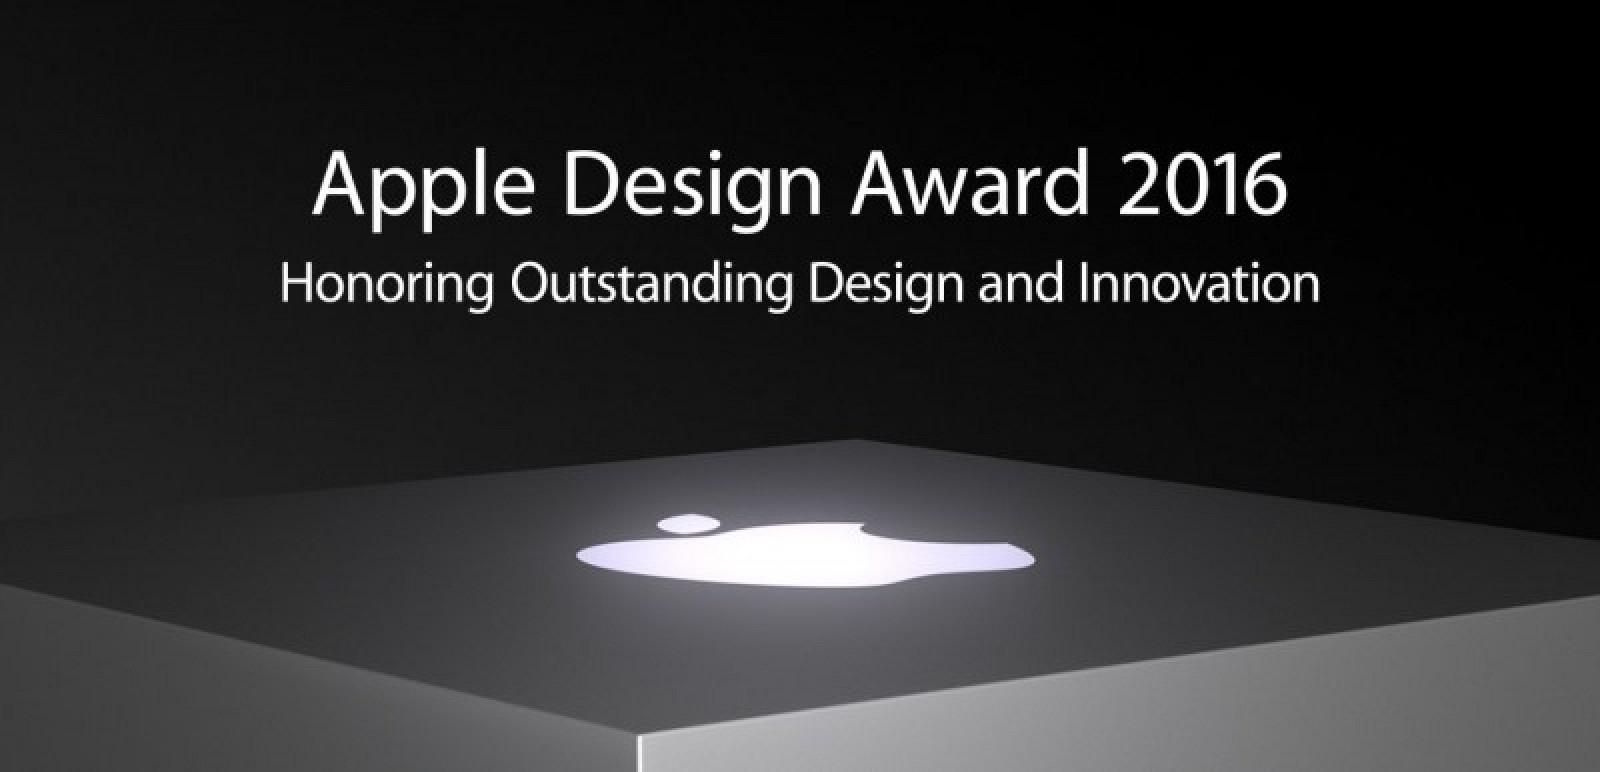 2016 Apple Design Award Winners Announced Lara Croft Go